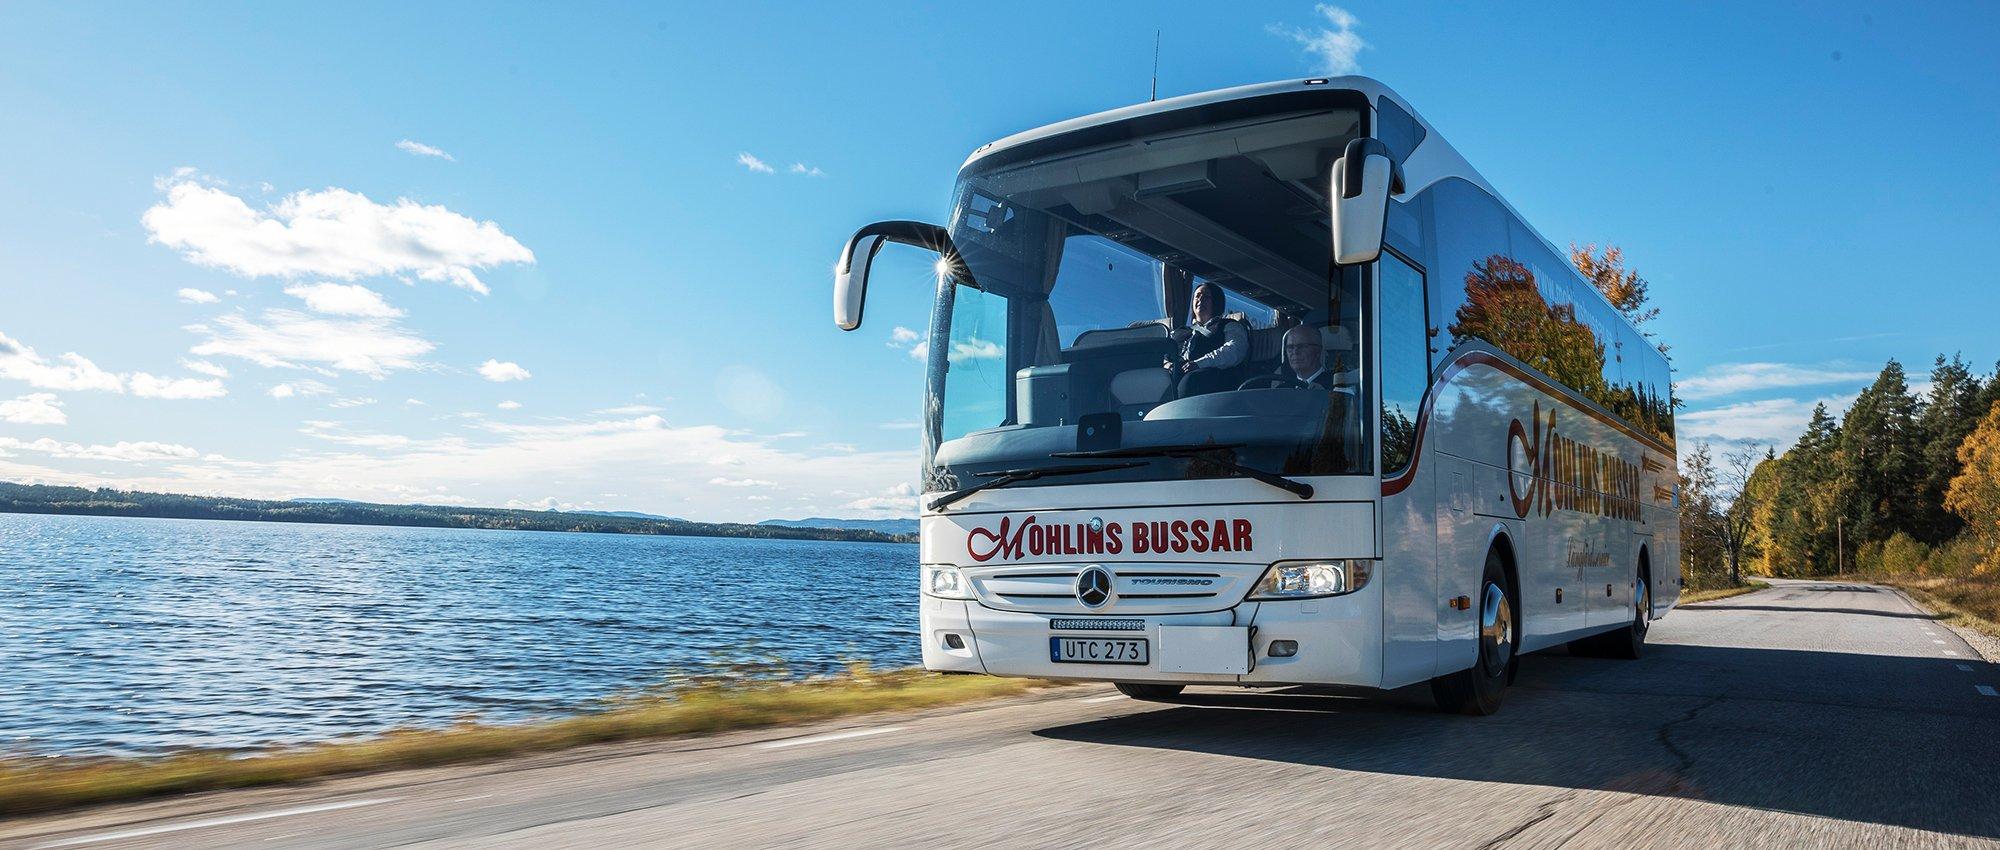 Mohlins_bussar